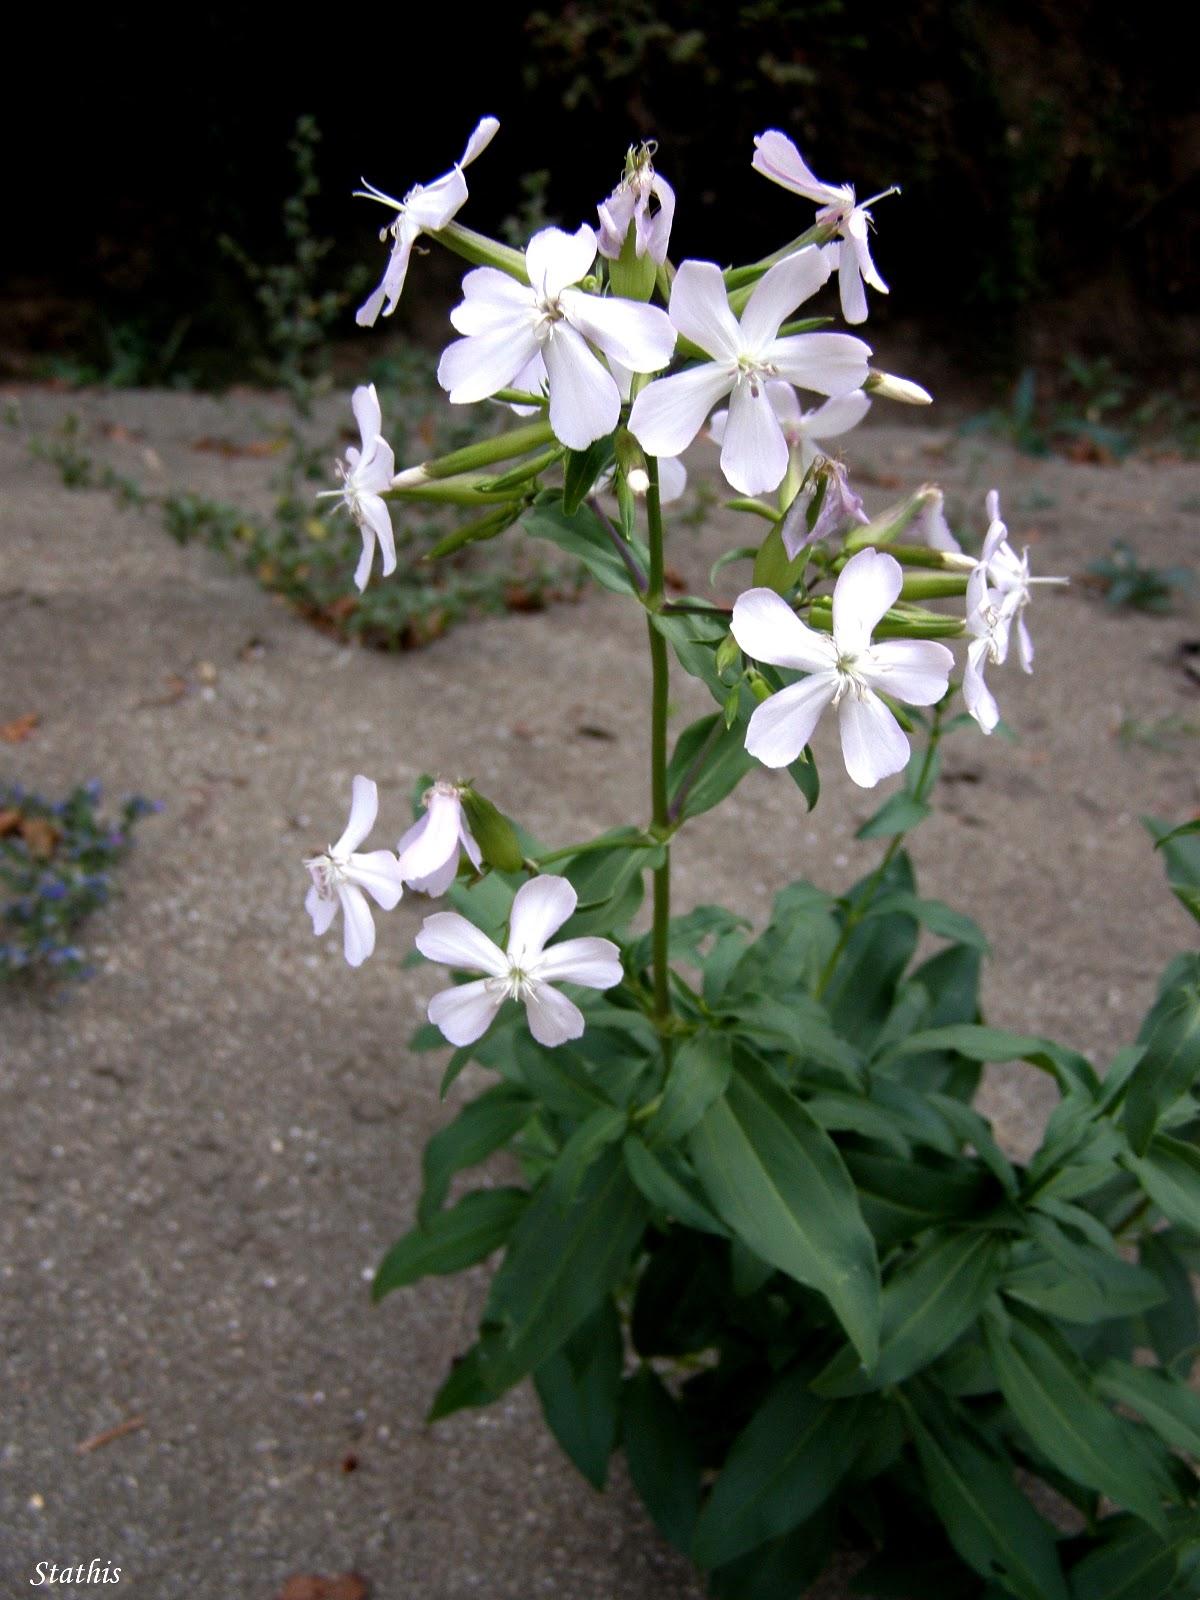 Photo: Saponaria officinalis L. Σαπωνάρια η φαρμακευτική Οικογένεια:Caryophyllaceae _ Καρυοφυλλοειδή Κοινή ονομασία: Γκολαρία, καλοστρούθι, σαπουνόρριζα, τσουένι, χαλβαδόρριζα, στρούθιον, σαπουνόχορτο, αγριογλυκόχορτο Τοποθεσία: Χαράδρα Βίκου  Εξάπλωση: Σε όλη την Ελλάδα. Περιγραφή: Ποώδες, πολυετές φυτό. Φύλλα αντίθετα, ελλειπτικά, προμήκη με 3 ή 5 παράλληλες νευρώσεις. Βλαστός όρθιος, απλός ή διακλαδιζόμενος, με ύψος έως 60 εκατοστά. Άνθη πολυάριθμα με ρόδινο χρωματισμό και 5 πέταλα. Ανθίζει Ιούλιο μέχρι Σεπτέμβριο. Ο καρπός της είναι κάψα.  Βιότοπος: Το συναντούμε σε αμμώδεις εκτάσεις της ορεινής και ημιορεινής ζώνης. https://plus.google.com/+FLORAFAUNAZAGORIGREECE  Μέρη του Φυτού με δραστικές ουσίες:Ρίζωμα, άνθη, φύλλα.  Δραστικές Ουσίες: Σαπορουμπίνη (σαπωνίνη, η οποία υδρολύεται προς γυψογενίνη), Διοσμίνη, Εσπεριδίνη (σαπωνίνες), Βιτεξίνη, Σαποναρίνη (φλαβονοειδές), βιταμίνη C.  Φαρμακολογικές δράσεις-Εφαρμογές: Χρησιμοποιείται ως υπακτικό, αντιρευματικό, χολαγωγό, εφιδρωτικό, διουρητικό, καθαρτικό, τονωτικό, αντιφλεγμονώδες και αποχρεπτικό σε βρογχίτιδα και κατά του ξηρού βήχα. Επίσης, χορηγείται εξωτερικά στην αντιμετώπιση των εκζεμάτων, του κνησμού και των λειχήνων και από του στόματος στη θεραπεία της ουρικής αρθρίτιδας.  Τρόπος Χορήγησης: Χορηγείται υπό τη μορφή αφεψήματος (τσάι, 10gr αποξηραμένης ρίζας ή φύλλων σε ένα φλυτζάνι του τσαγιού νερό, 1-2 φλυτζάνια του τσαγιού την ημέρα) και βάμματος (1-2ml, 3 φορές την ημέρα). Το αφέψημα μπορεί να εφαρμοστεί εξωτερικά υπό την μορφή κομπρεσών στις δερματικές παθήσεις.  Ανεπιθύμητες Ενέργειες: Ελαφρώς τοξική. Πιθανή αιμόλυση.  ΠΑΝΕΠΙΣΤΗΜΙΟ ΙΩΑΝΝΙΝΩΝ ΤΜΗΜΑ ΙΑΤΡΙΚΗΣ ΕΡΓΑΣΤΗΡΙΟ ΦΑΡΜΑΚΟΛΟΓΙΑΣ Φαρμακευτικά Φυτά της Ηπείρου http://mediplantepirus.med.uoi.gr/pharmacology/plant_details.php?id=36